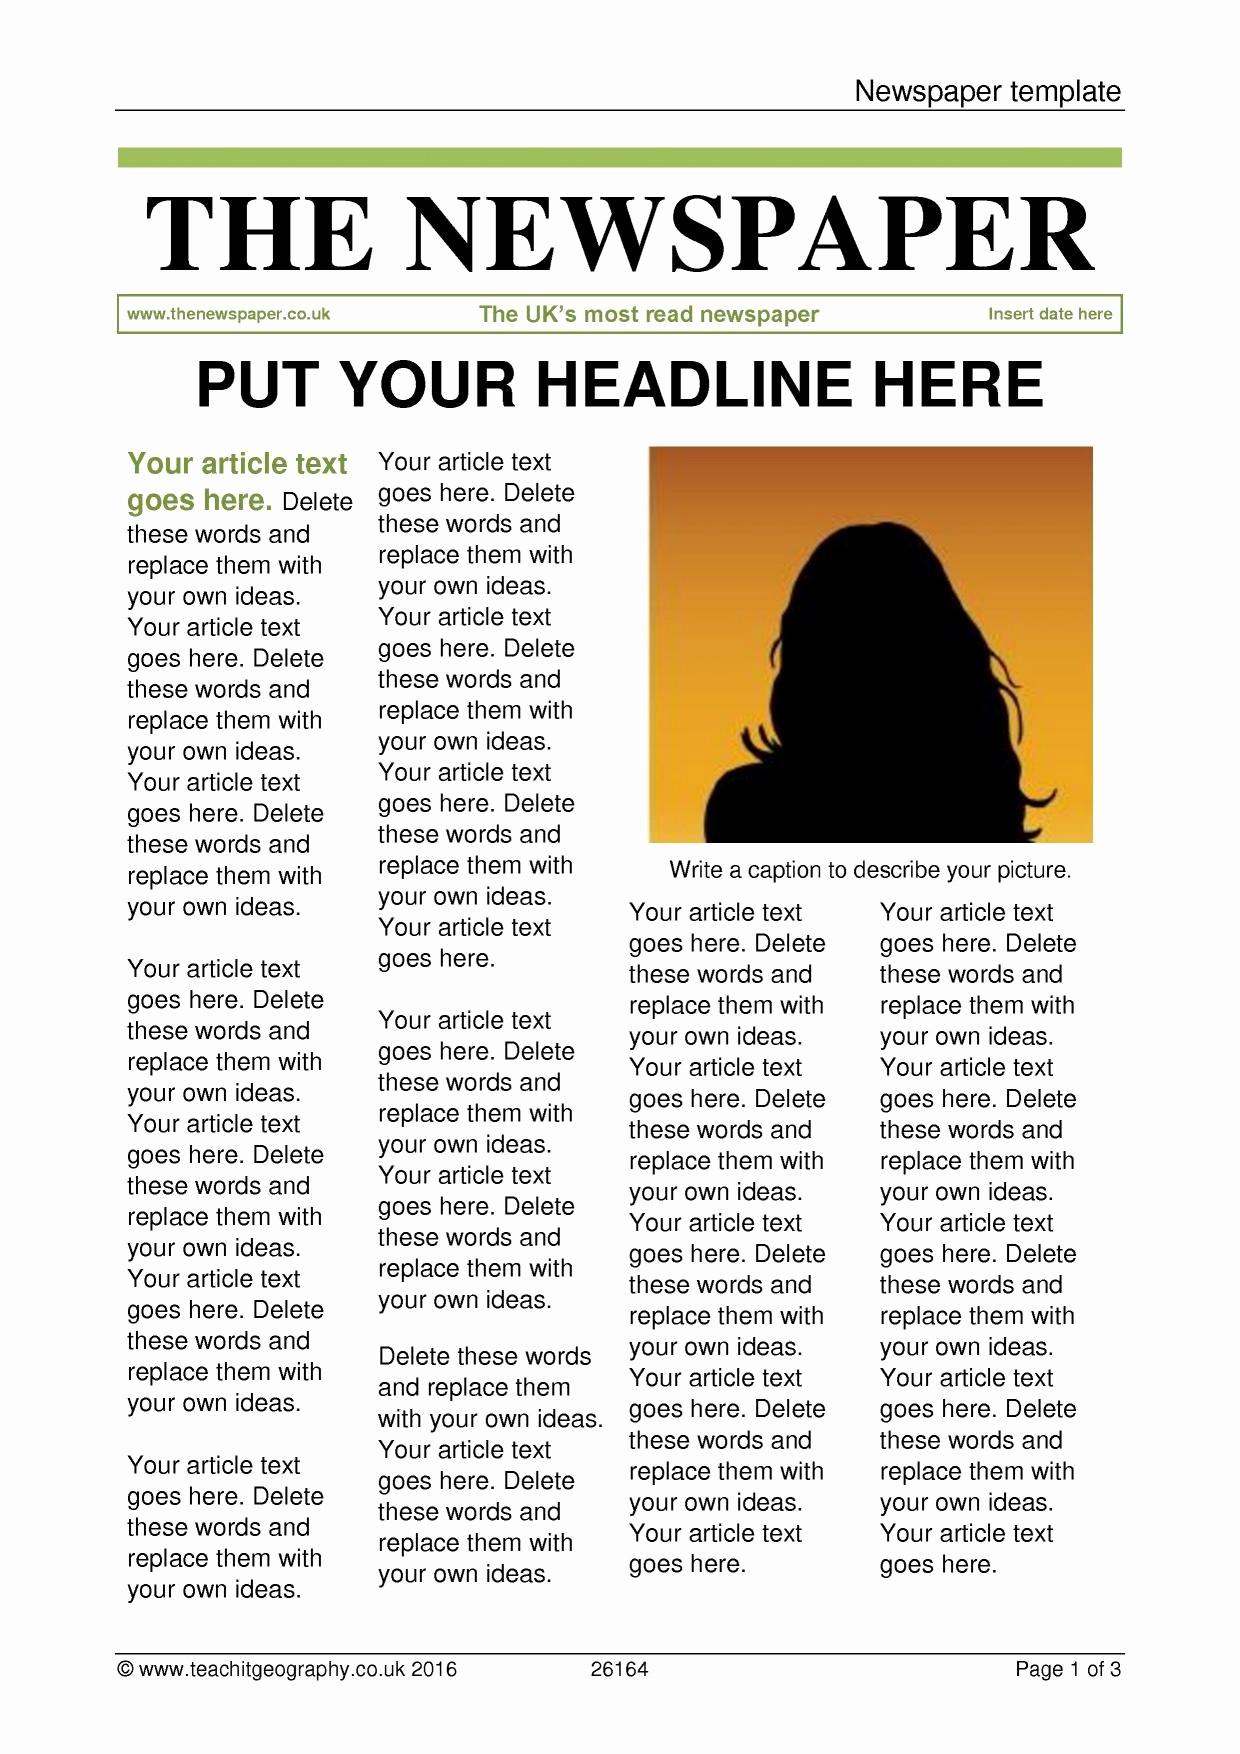 Newspaper Article Template Microsoft Word Beautiful Newspaper Template